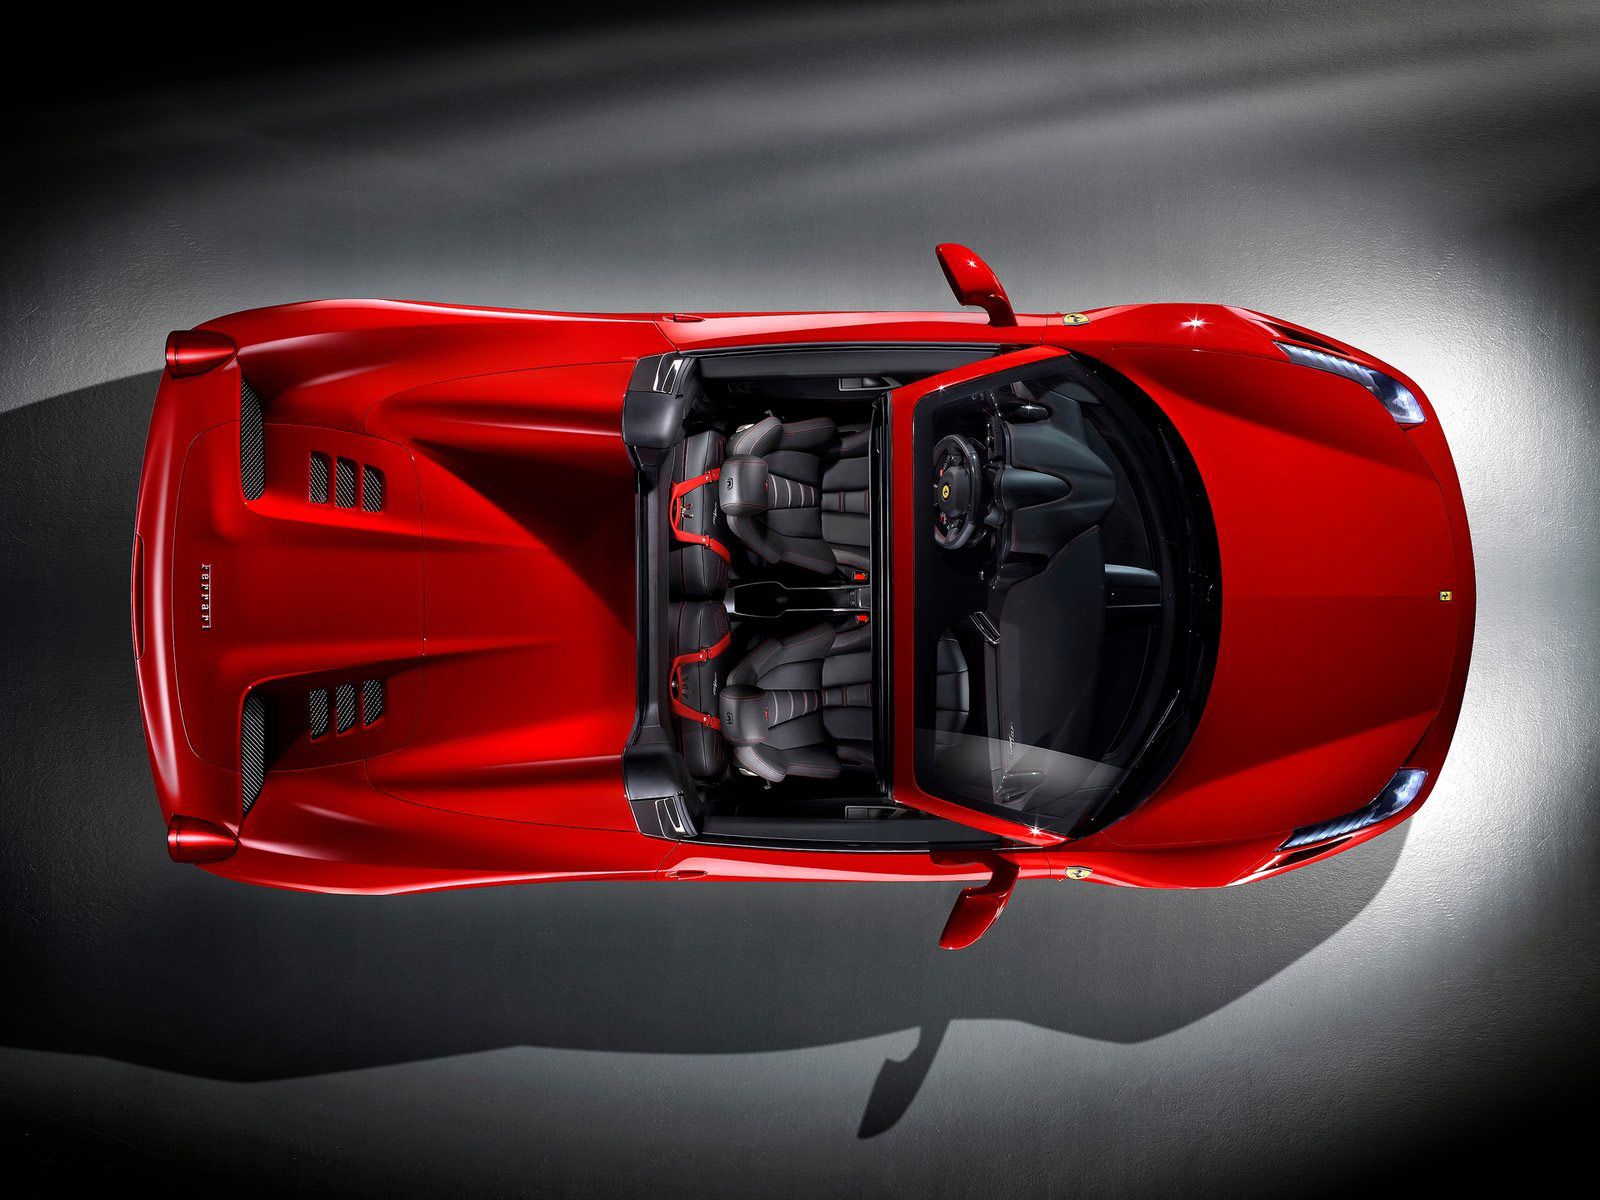 Gambar Mobil Ferrari: Foto Mobil Sport FERRARI 458 Spider 2013